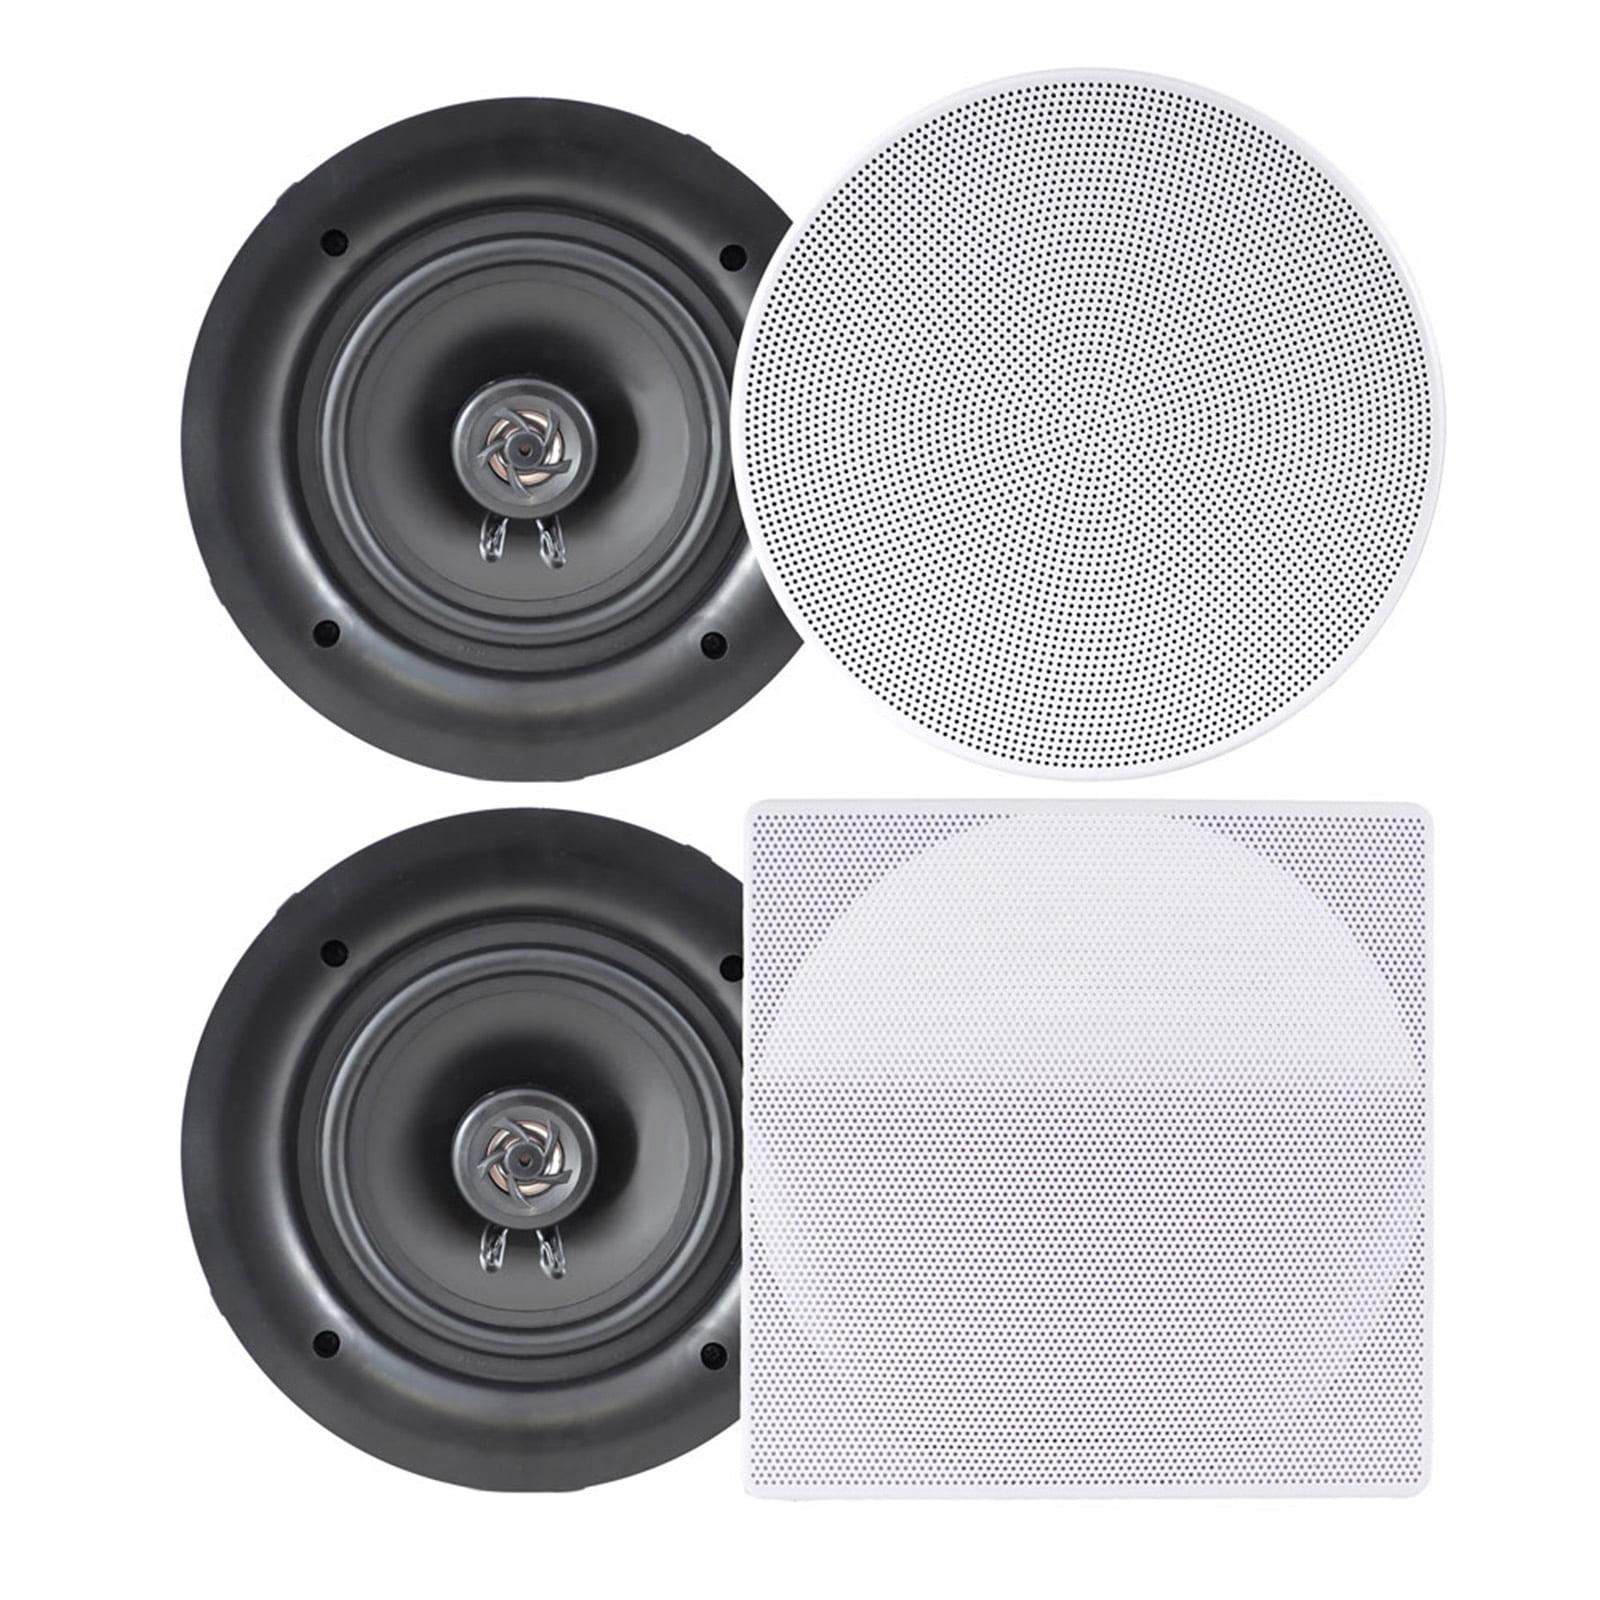 "Pyle 6.5"" In-Wall / In-Ceiling Dual Stereo Speakers, 200"